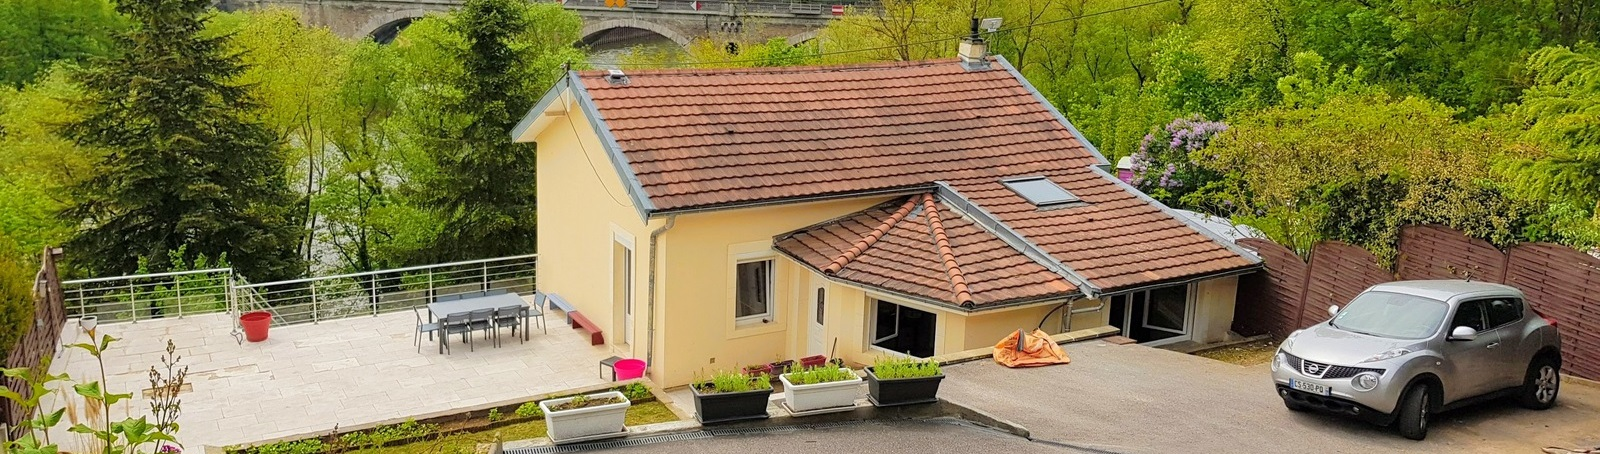 Pavillon individuel à Liverdun